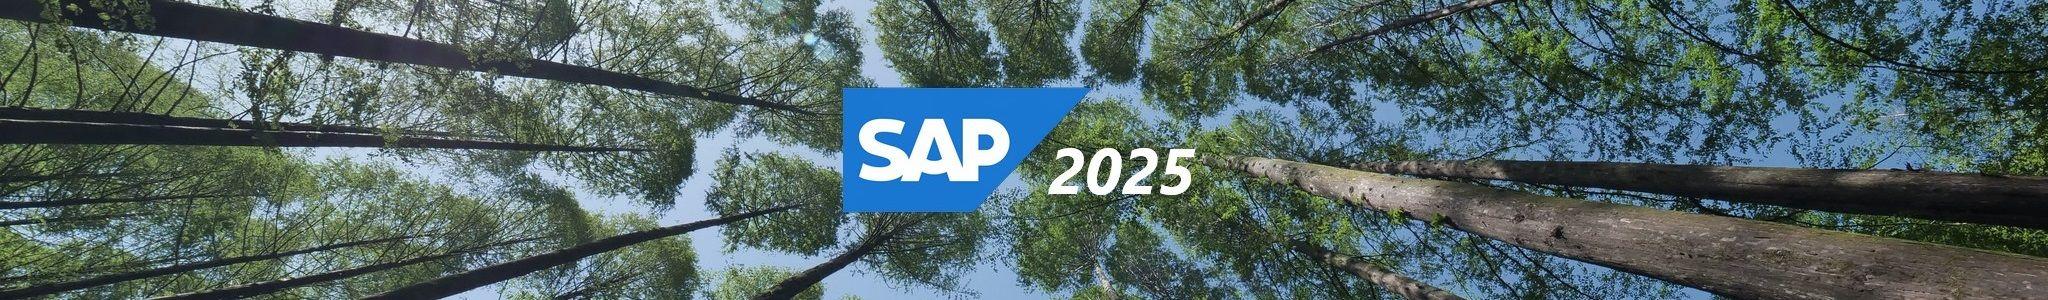 sap 2025